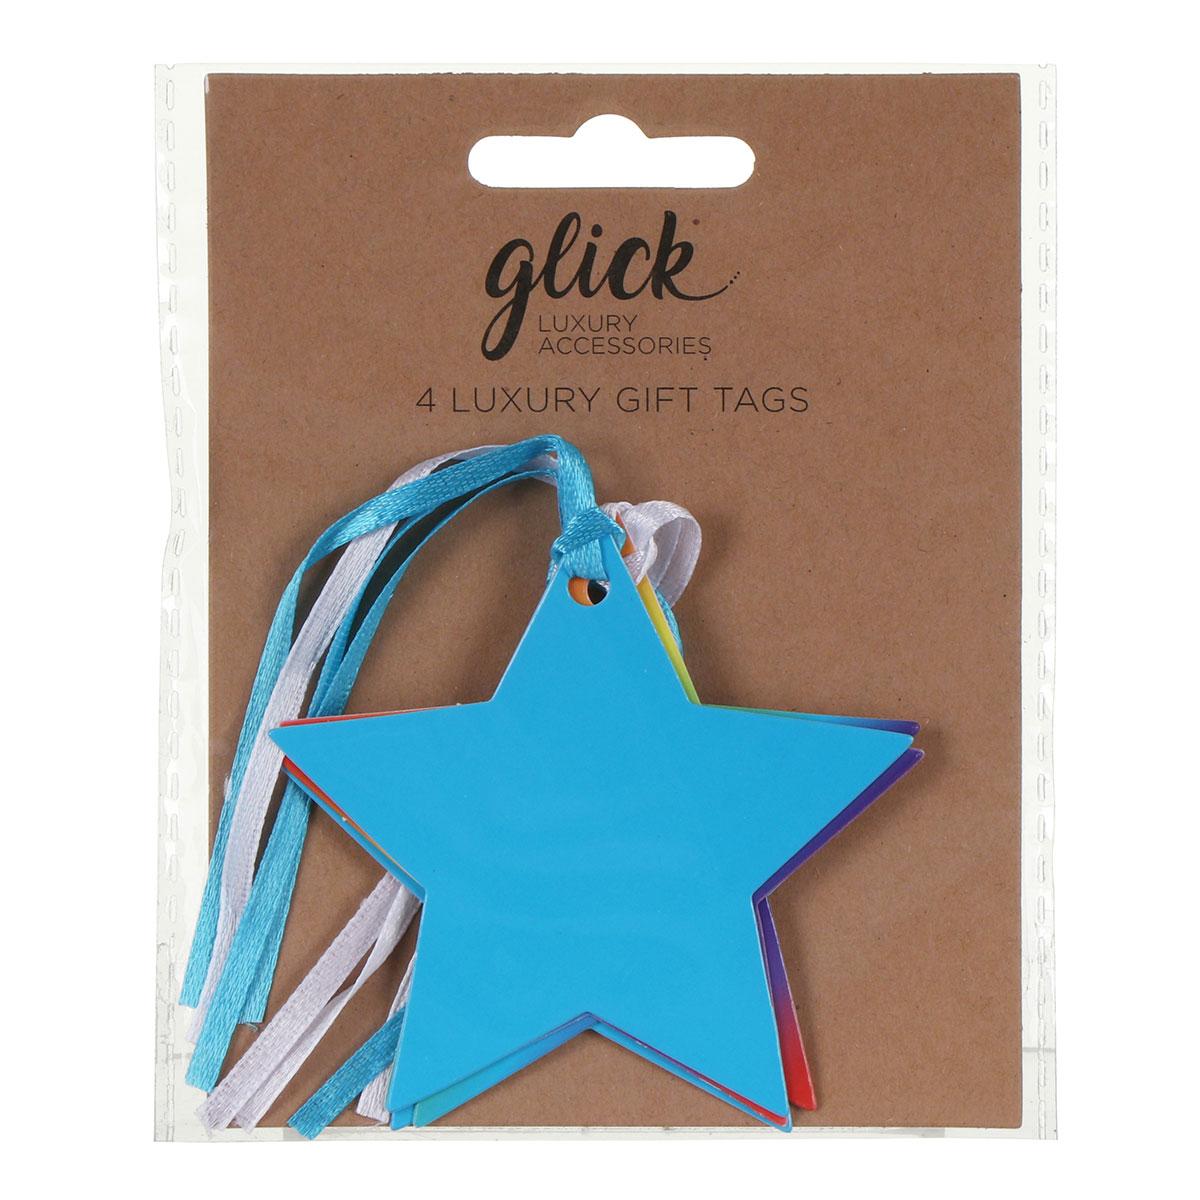 Glick Bright Stars Gift Tags